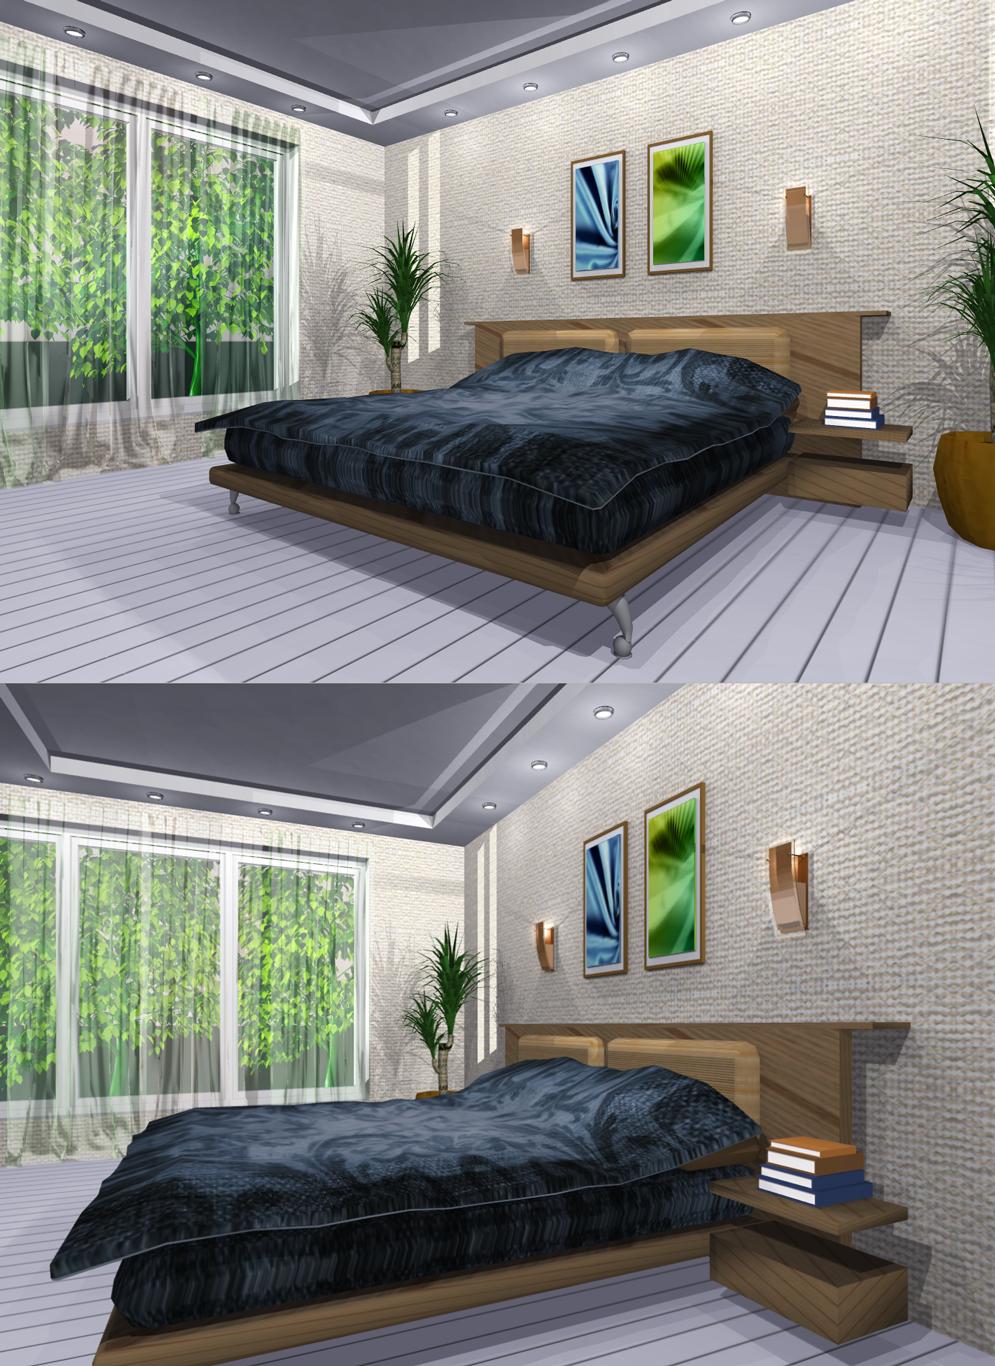 bedroomdesign created in #LiveHome3D #homedesign #interiordesign ...